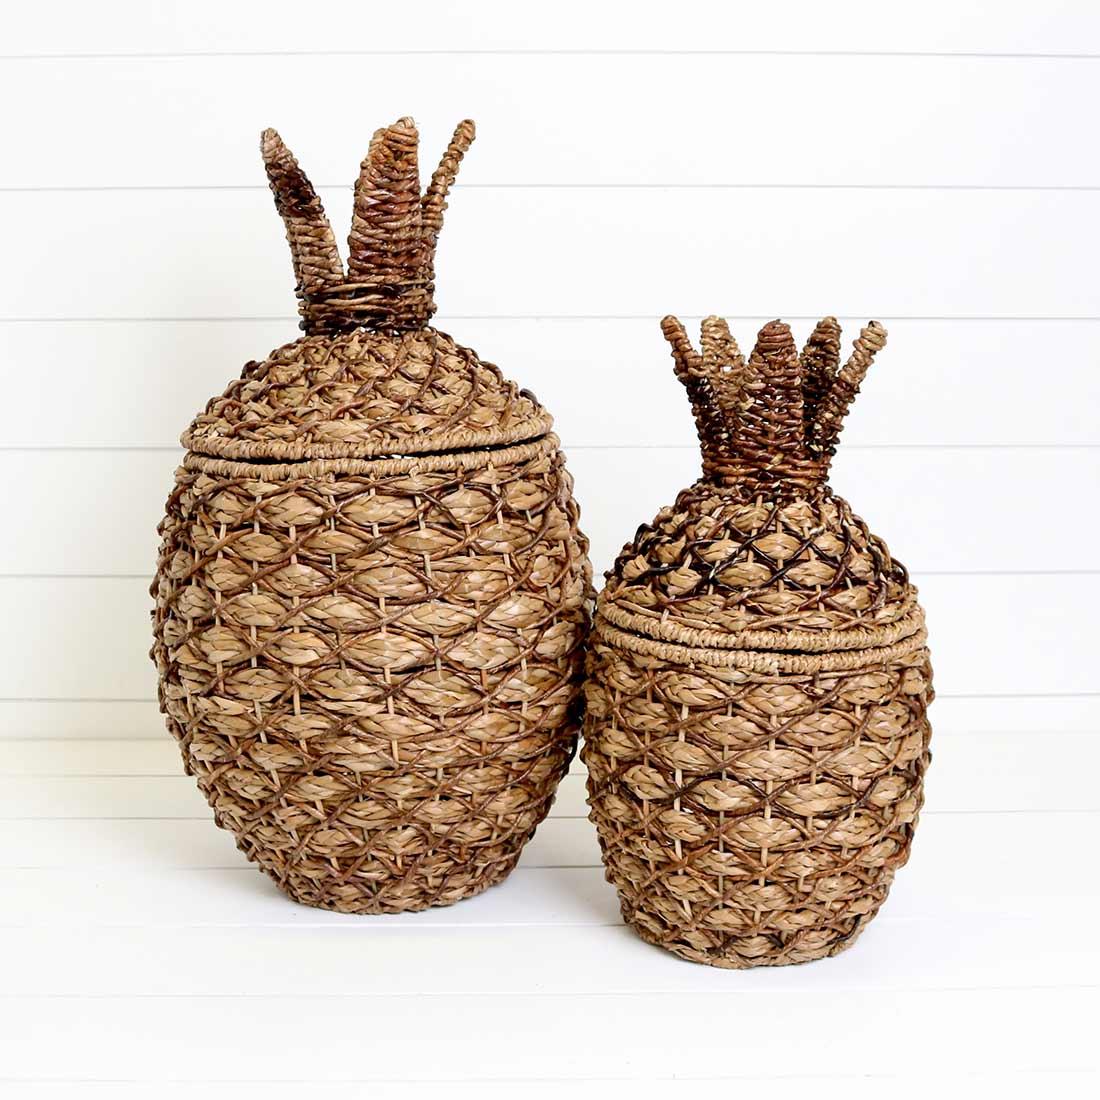 Pineapple Baskets